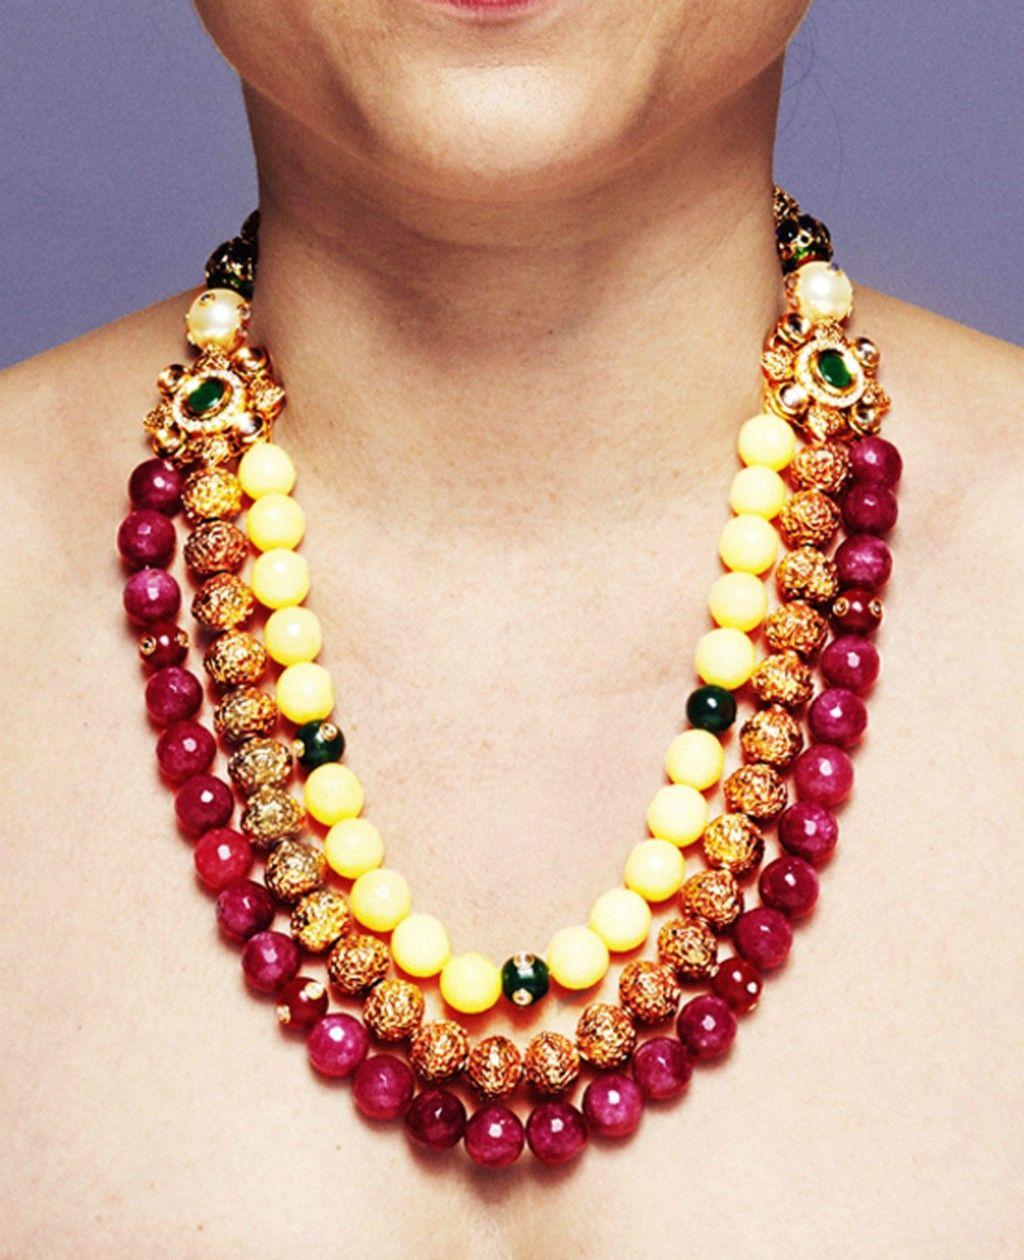 Semi Precious Stone Jewelry India S Fashion | Beaded necklaces etc ...